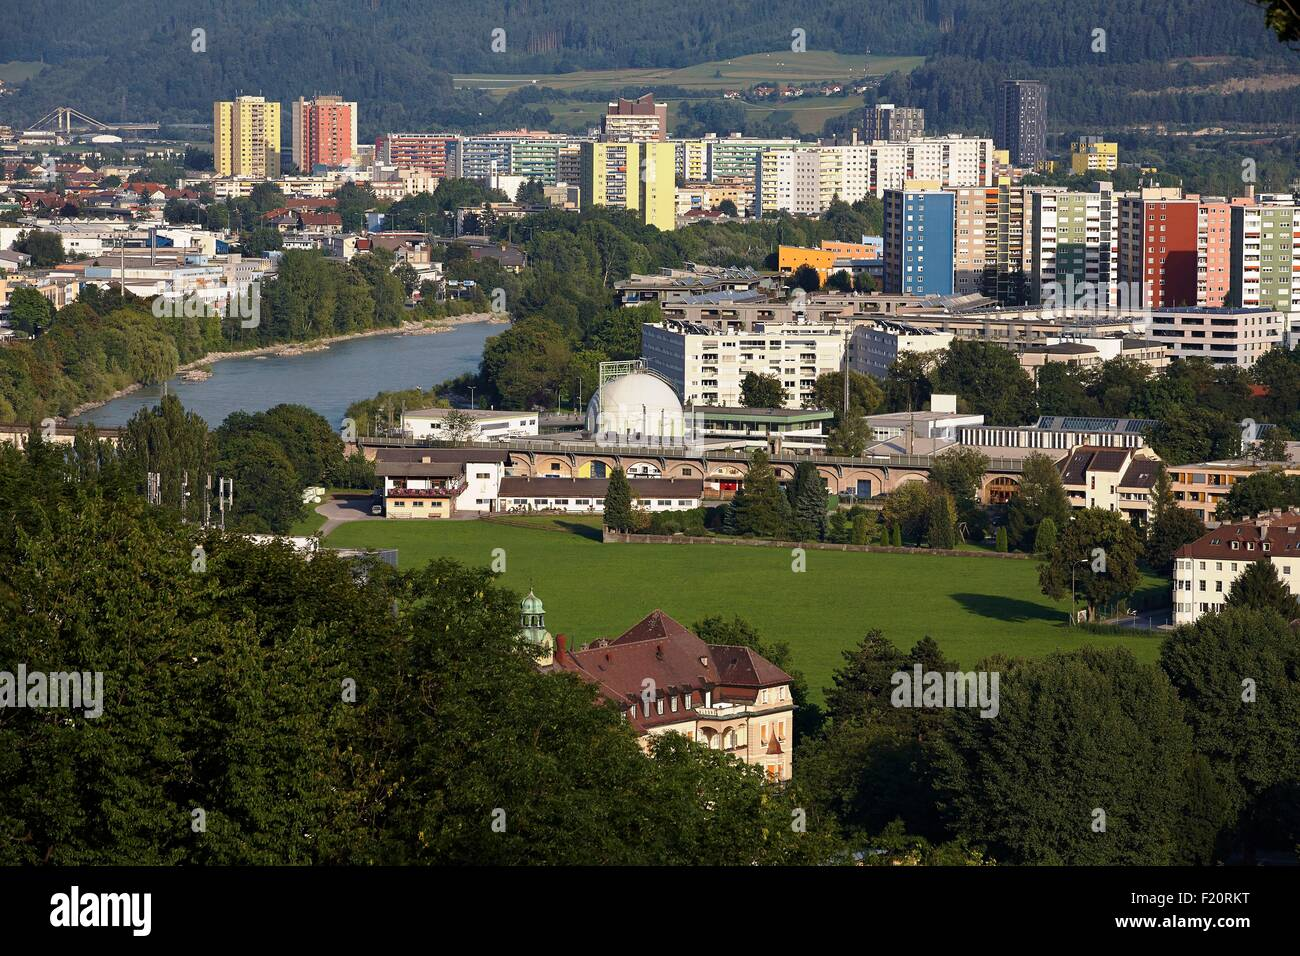 Austria, Tyrol, Innsbruck, View over the modern city crossed by the river Inn - Stock Image